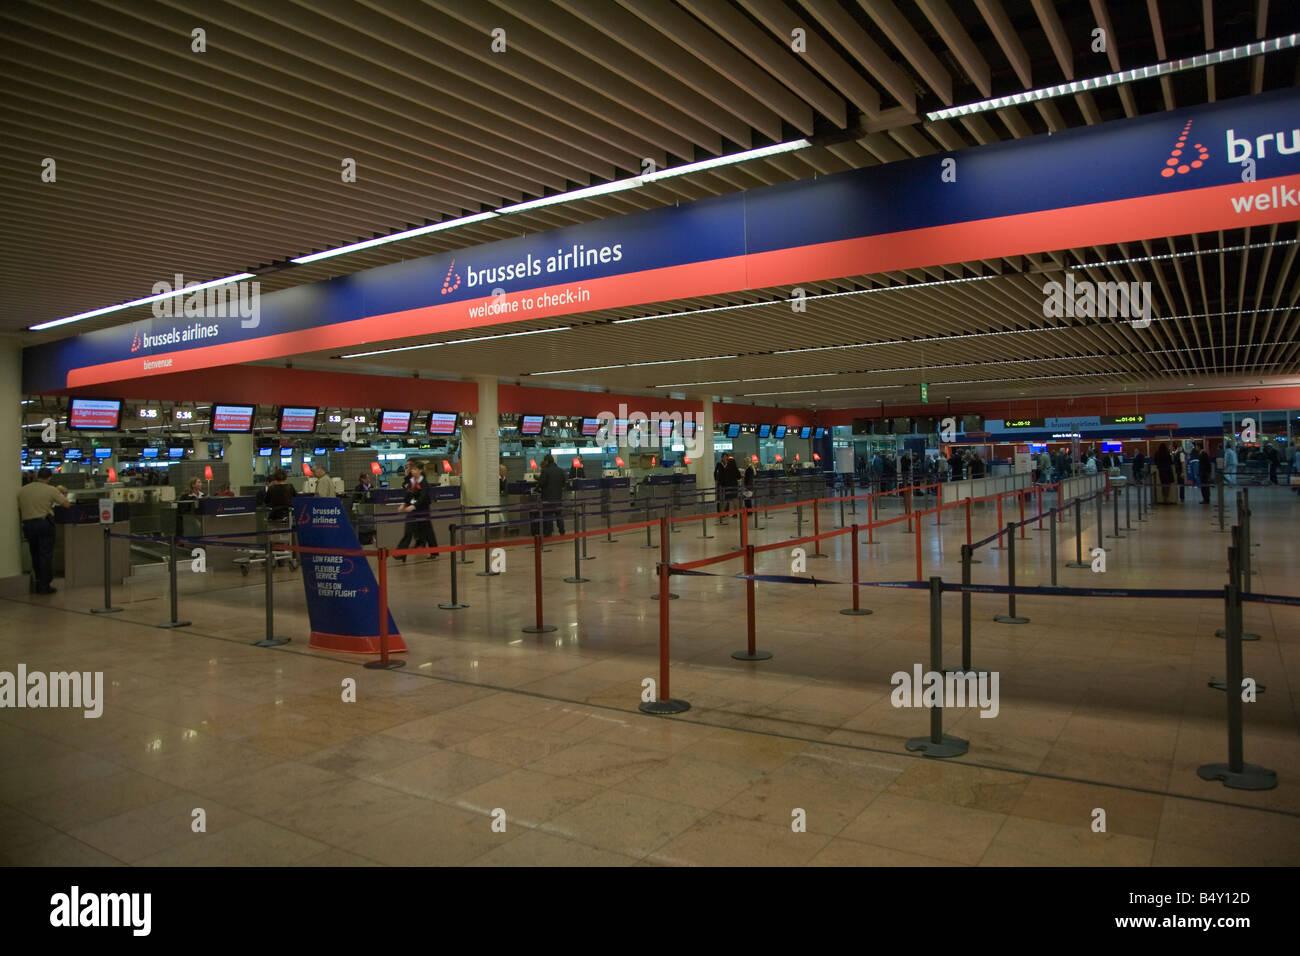 Bureau de change bruxelles airport: hotel pentahotel brussels